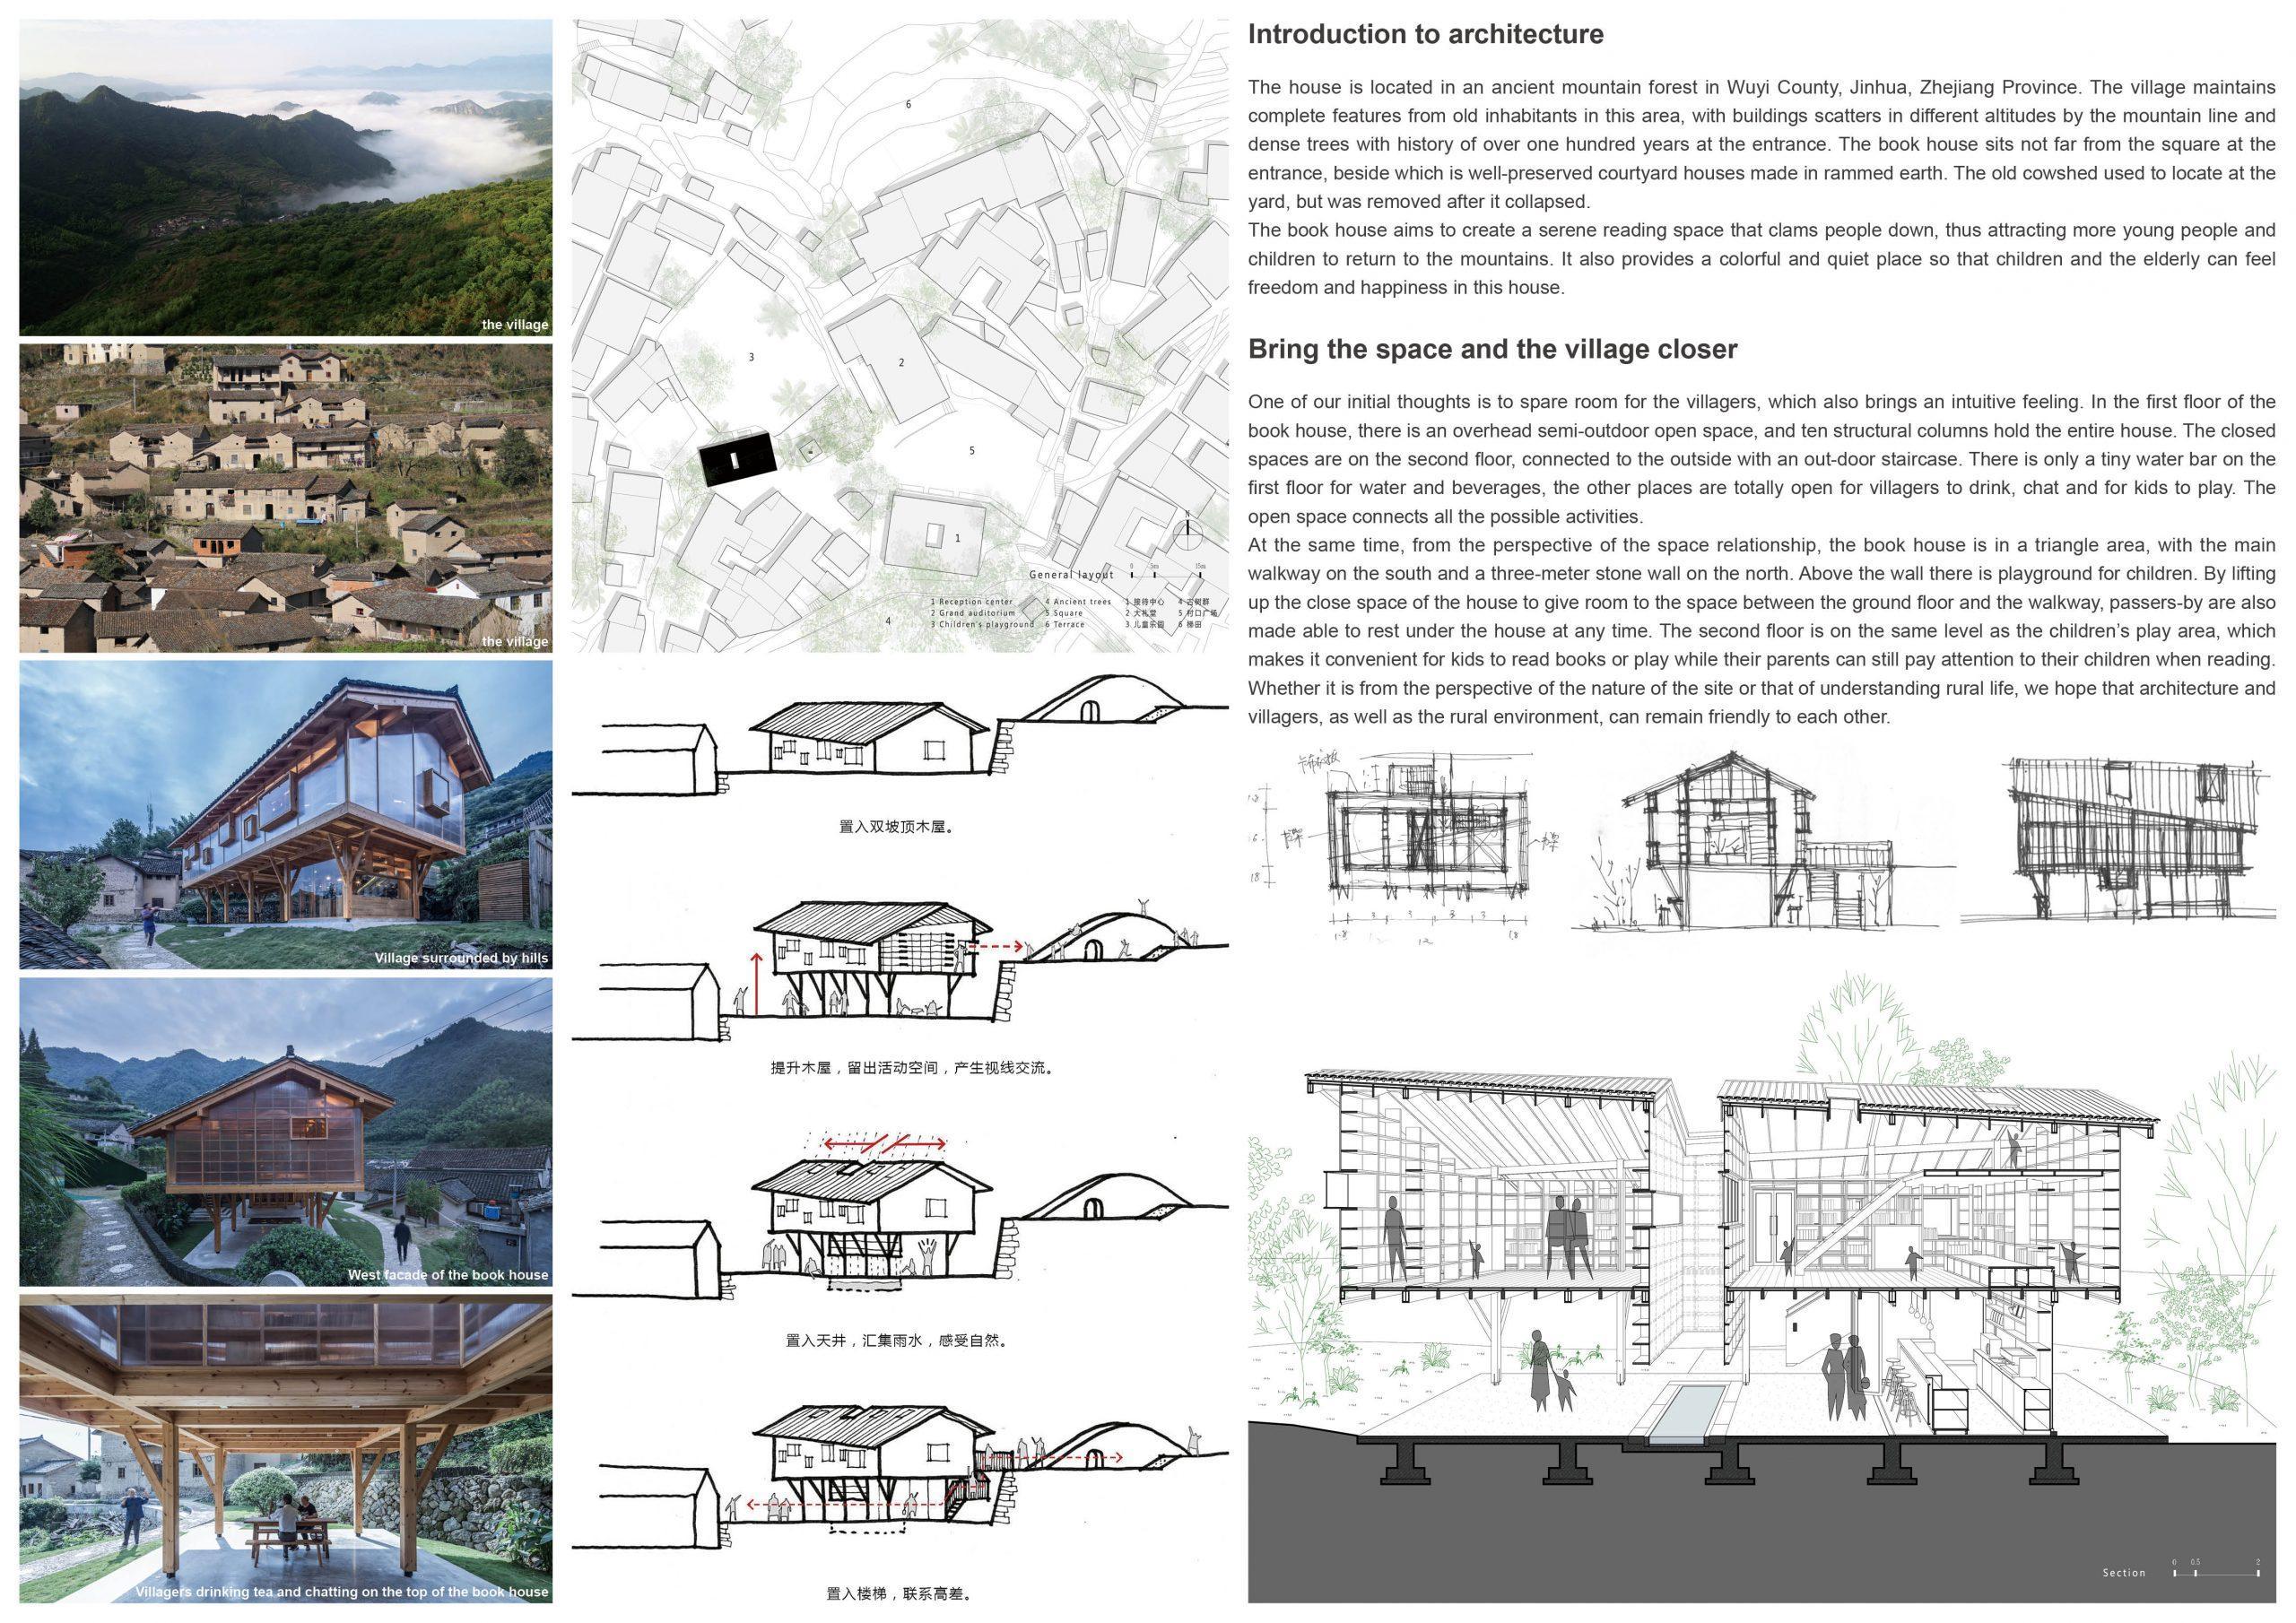 Silver Prize In Architectural Design Book House 02